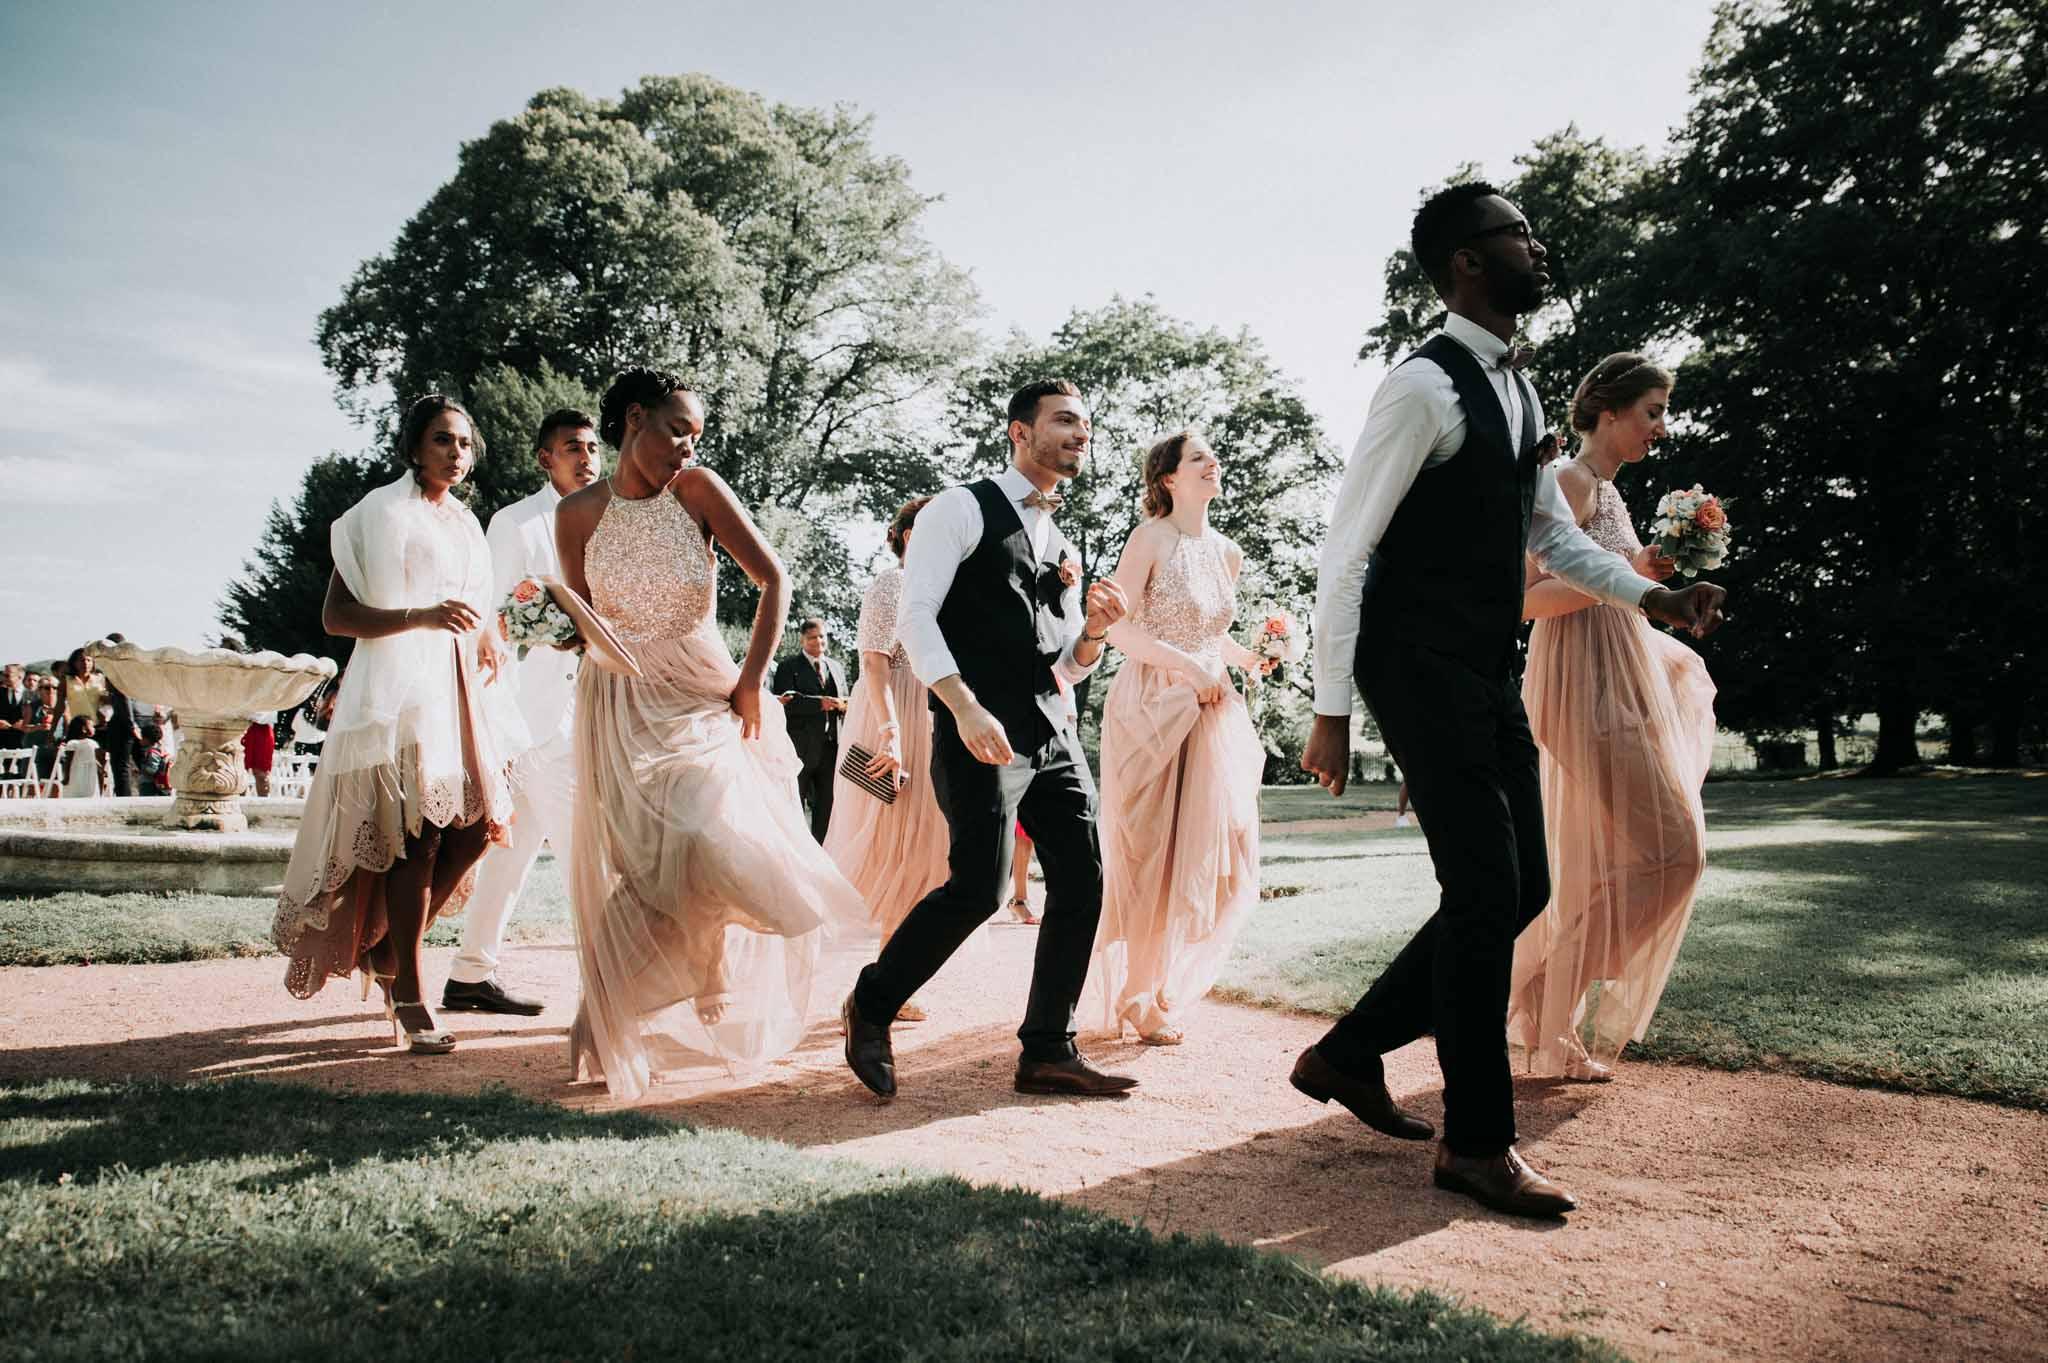 2017-07-15 - DSC_8324 - photographe - mariage - www.lauriediazwedding.com.jpg